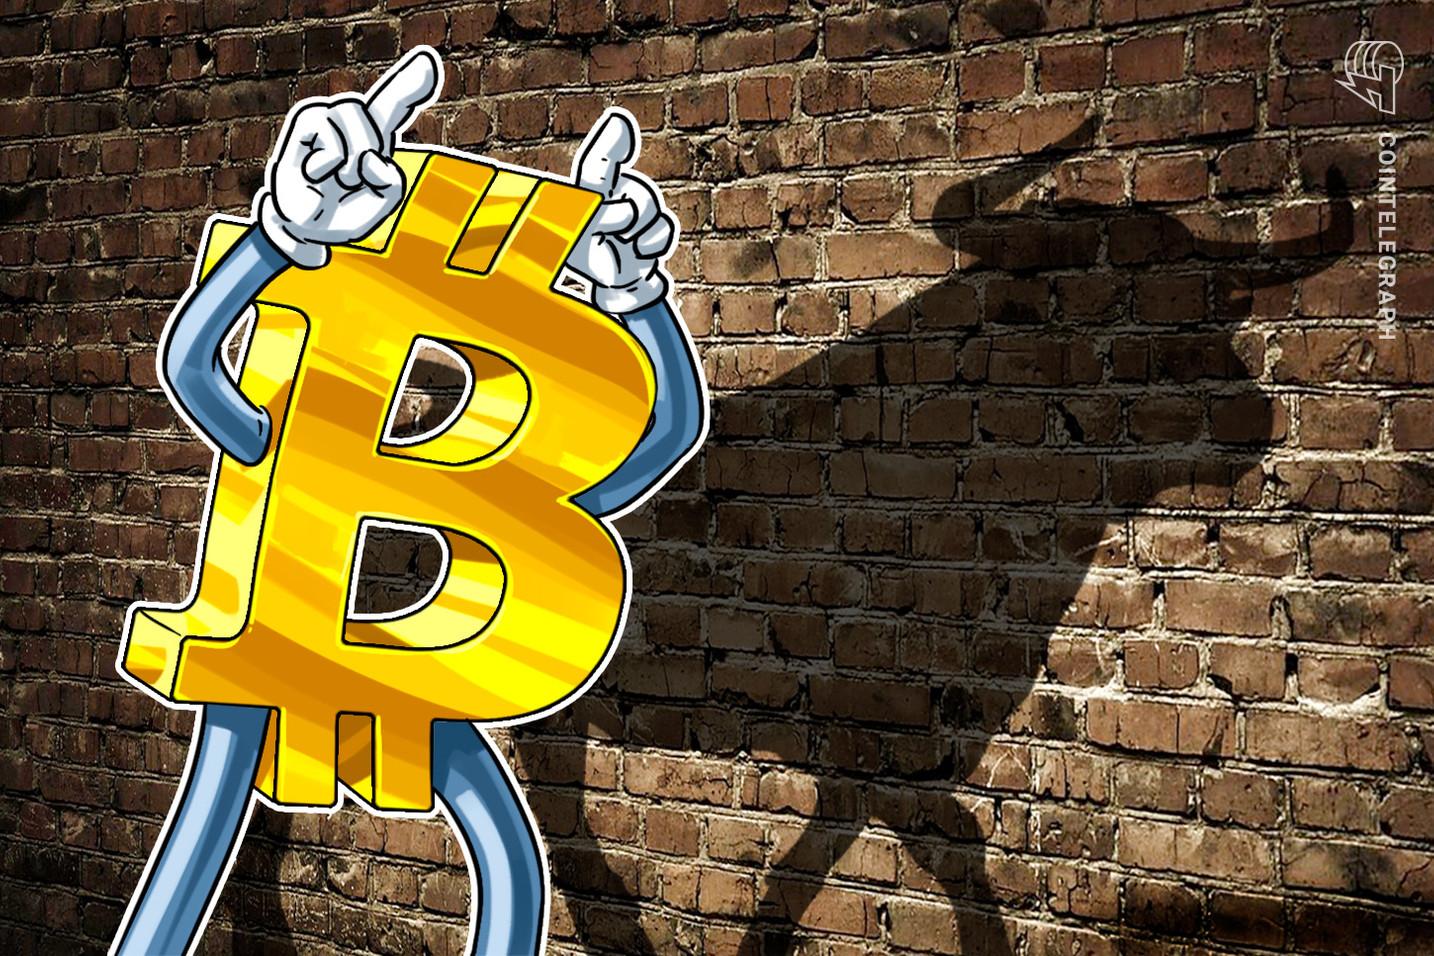 3 Bitcoin Price Metrics Just Converged — A Bull Run Has Always Followed